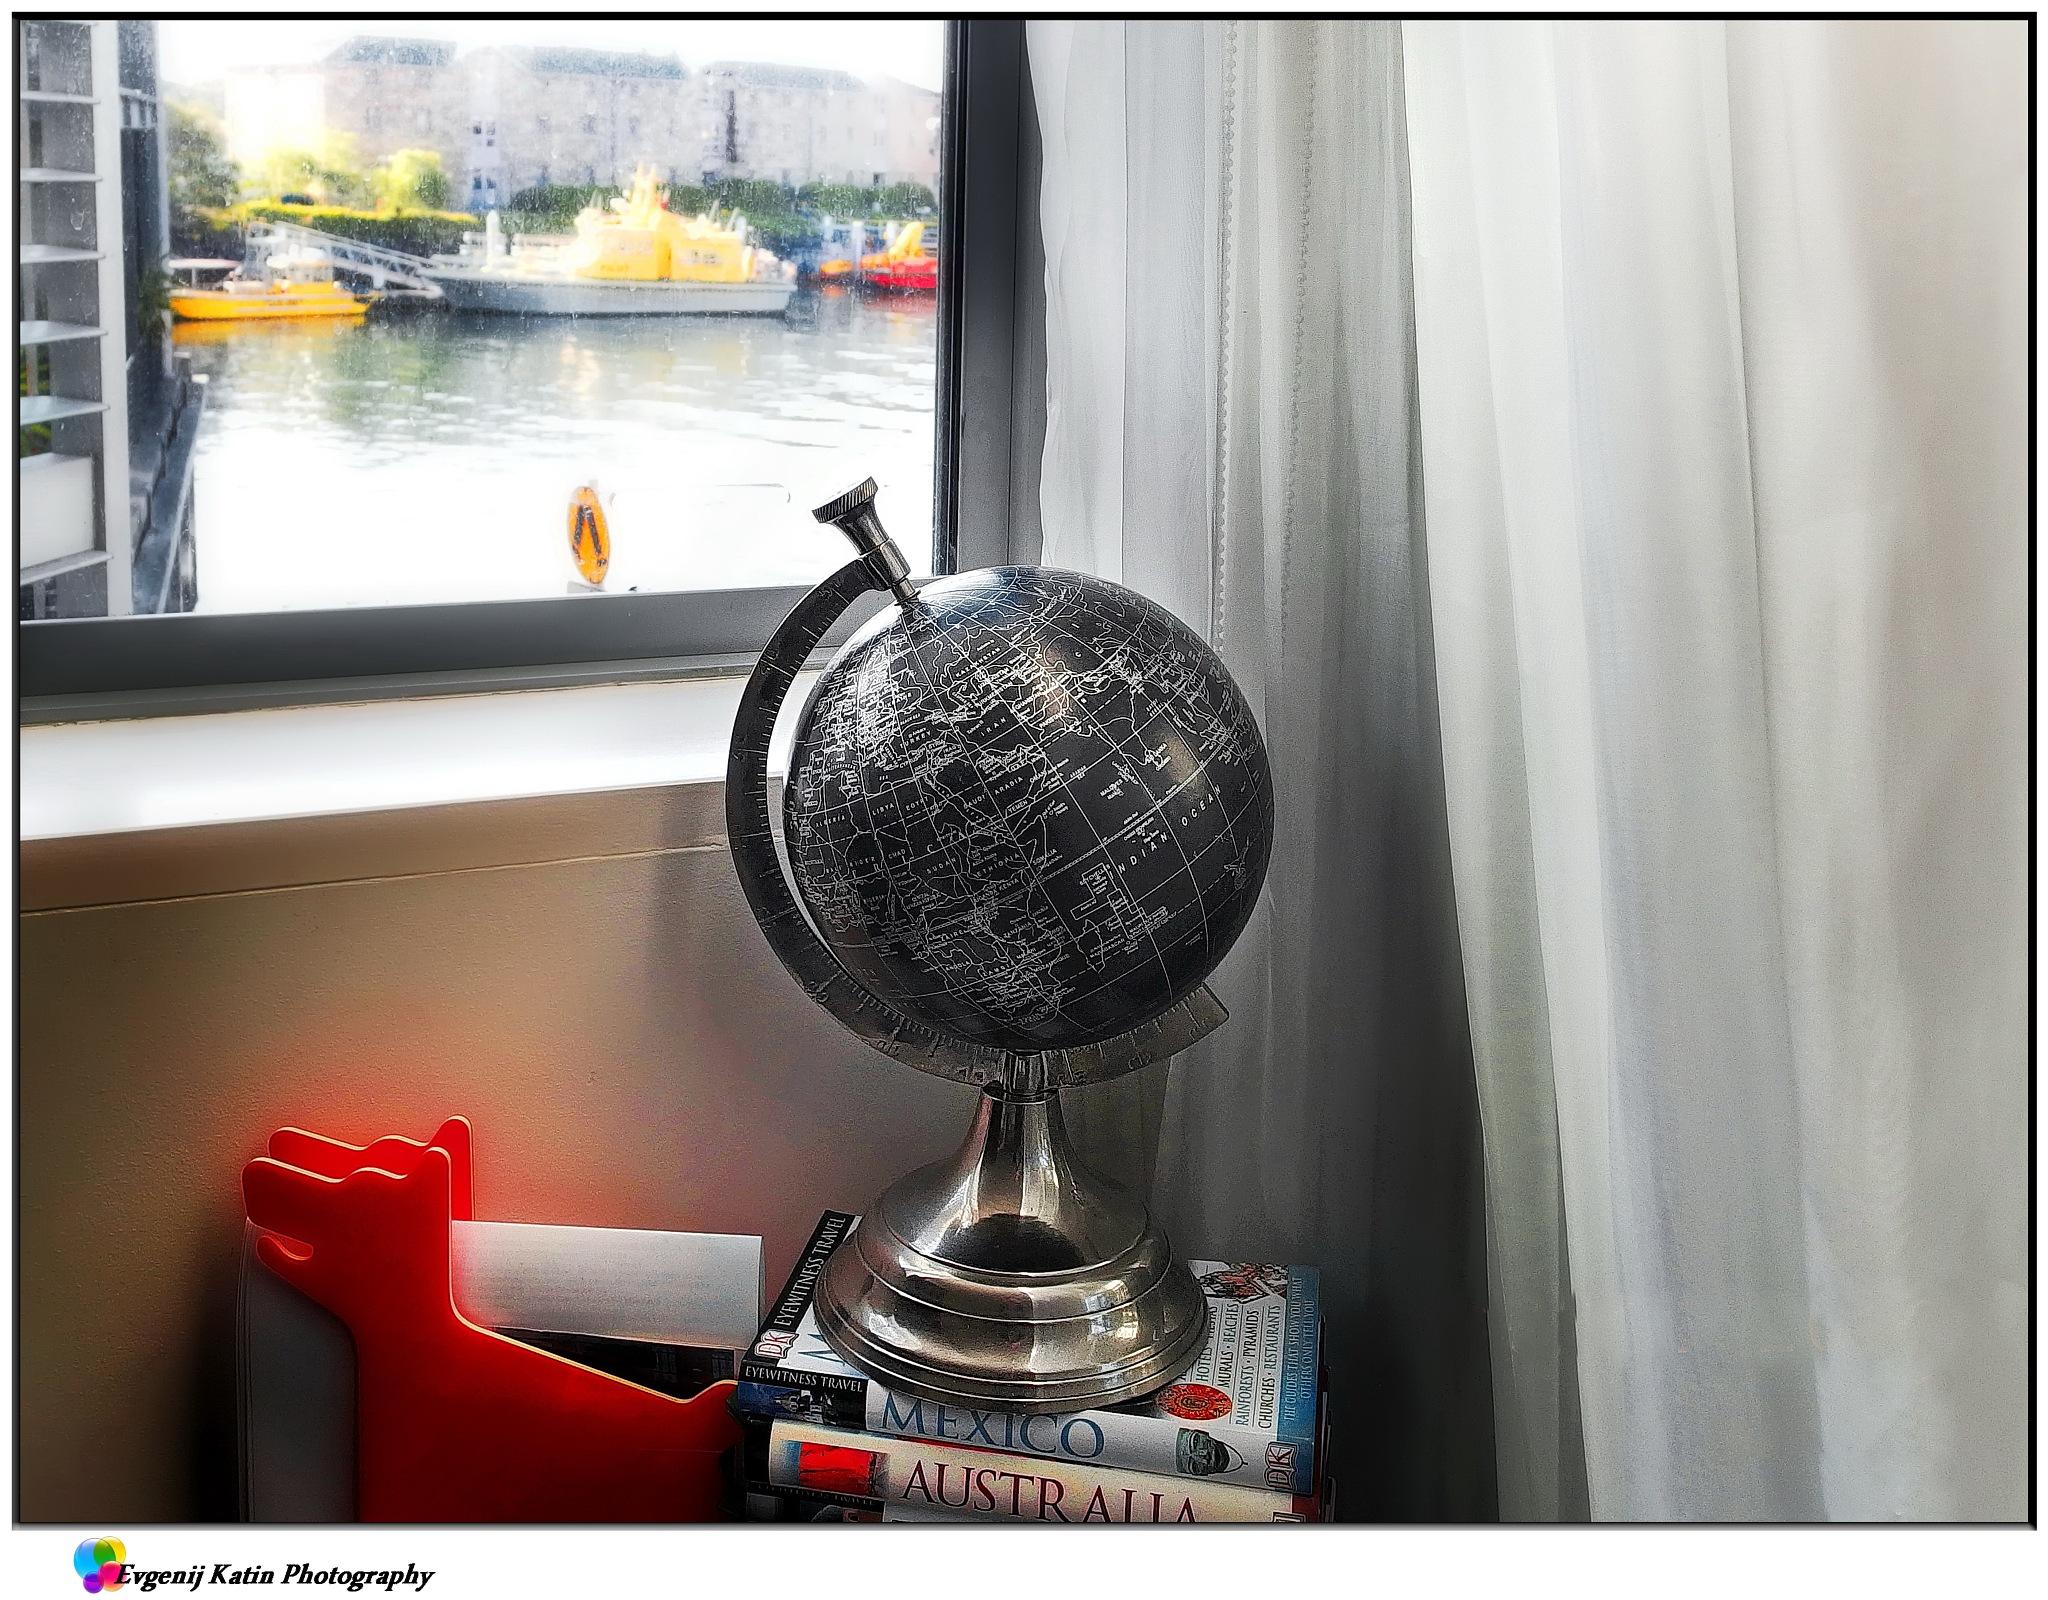 Travelling at sofa III by Evgenij Katin